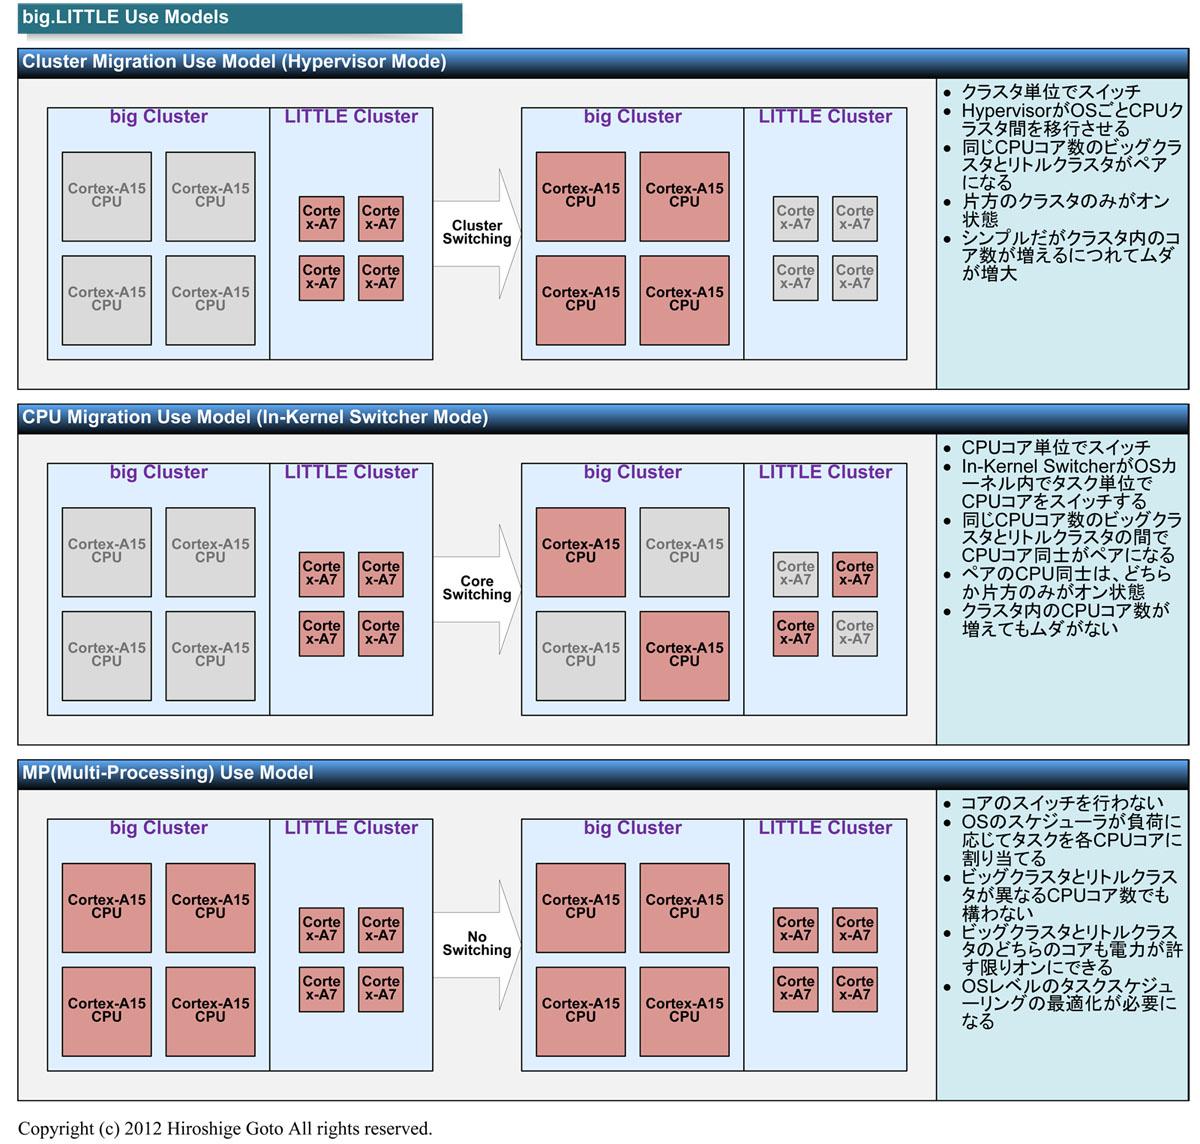 "big.LITTLEの各ユースモデル(PDF版は<span class=""img-inline raw""><a href=""/video/pcw/docs/600/181/p11.pdf"" ipw_status=""1"" ipw_linktype=""filelink_raw"" class=""resource"">こちら</a></span>)"